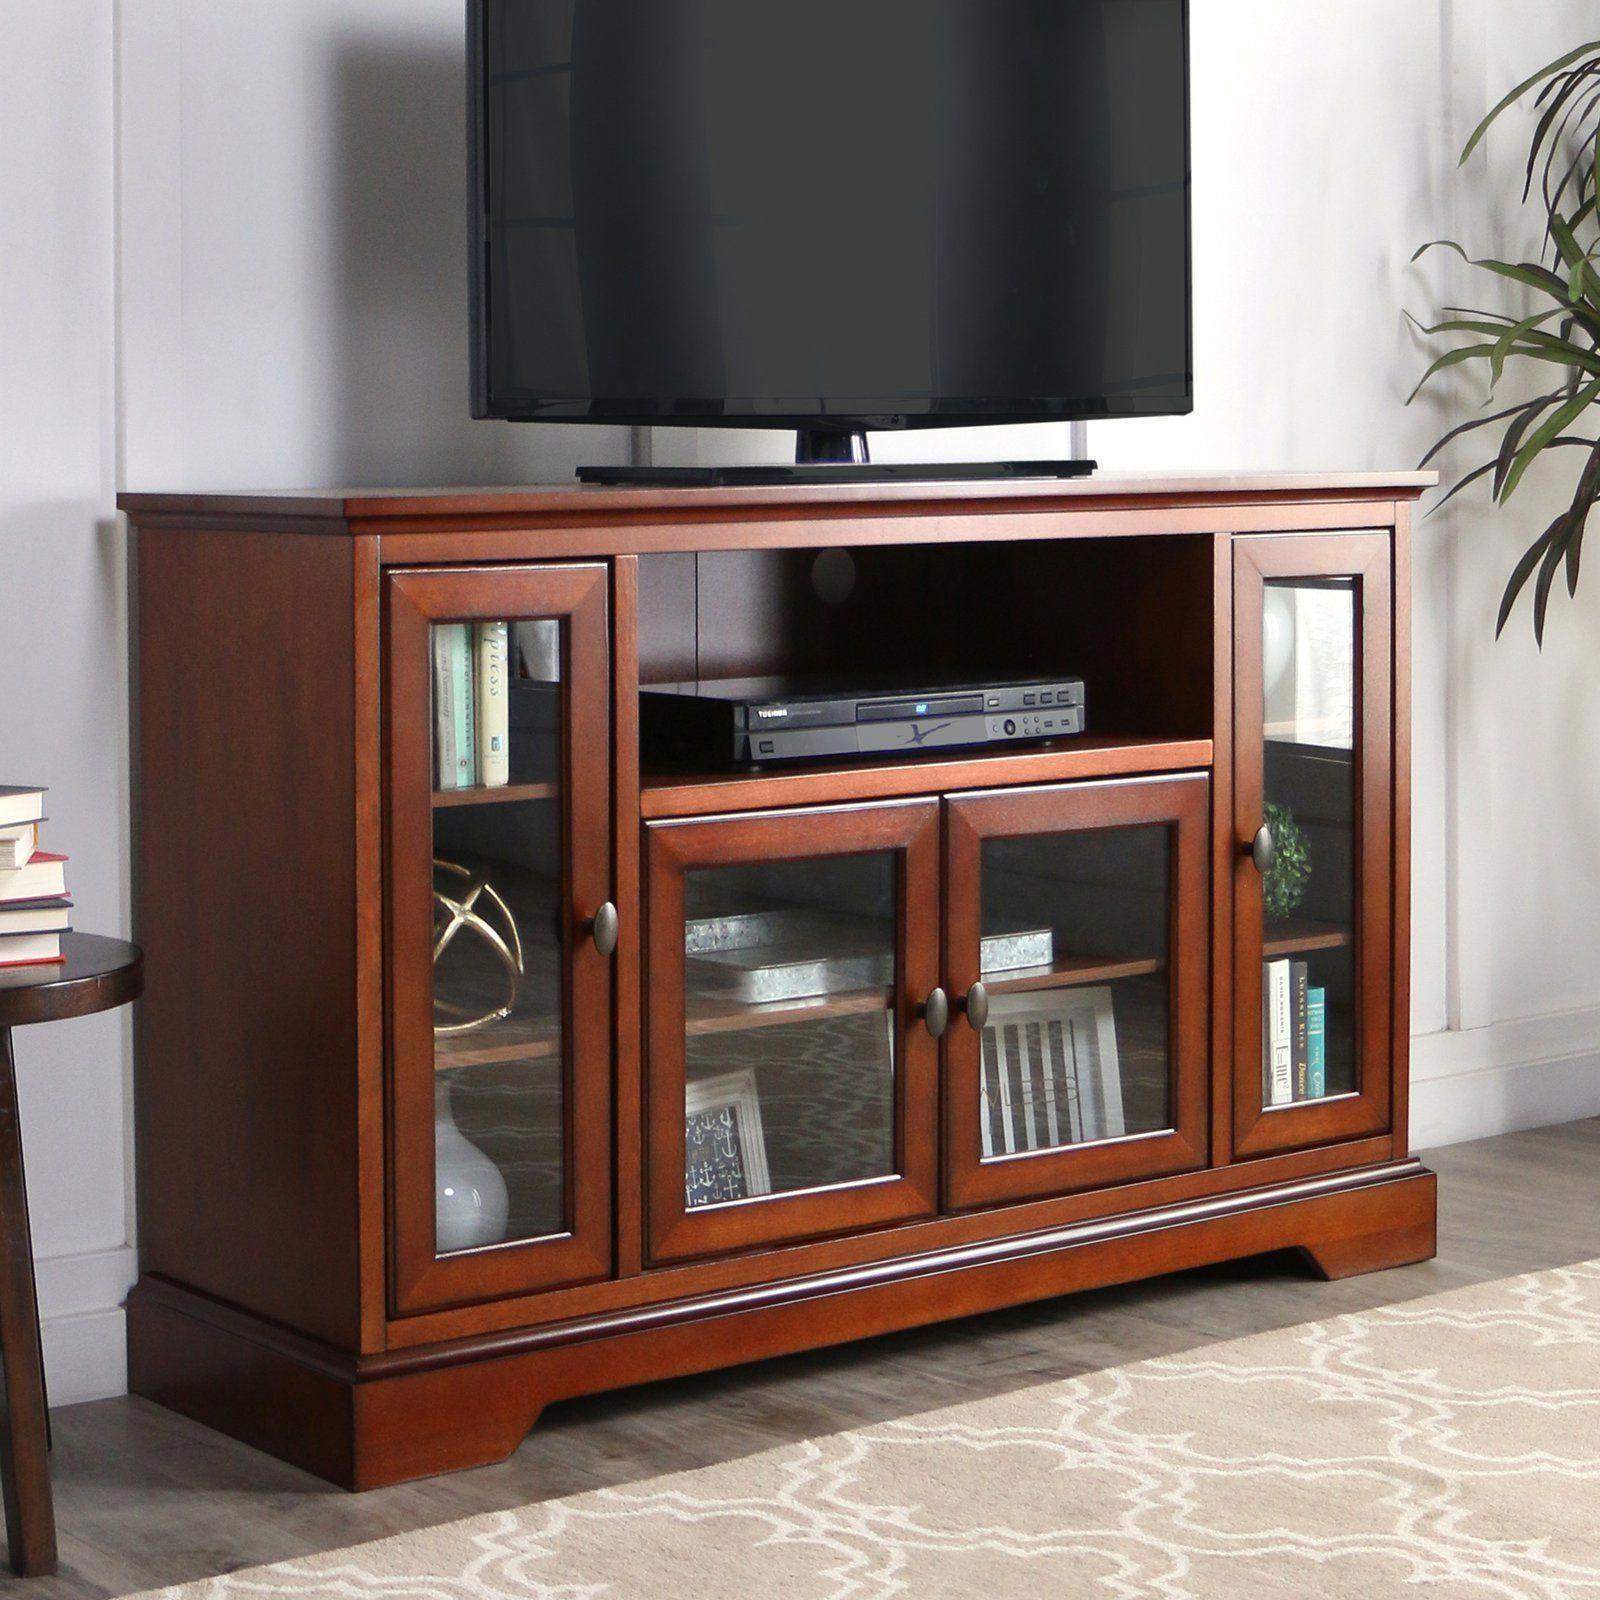 Walker Edison 52 In Highboy Style Brown Wood Tv Stand Hn52c32rb Kitchenfurniturebrown Tv Stand Wood Saracina Home Highboy Tv Stand